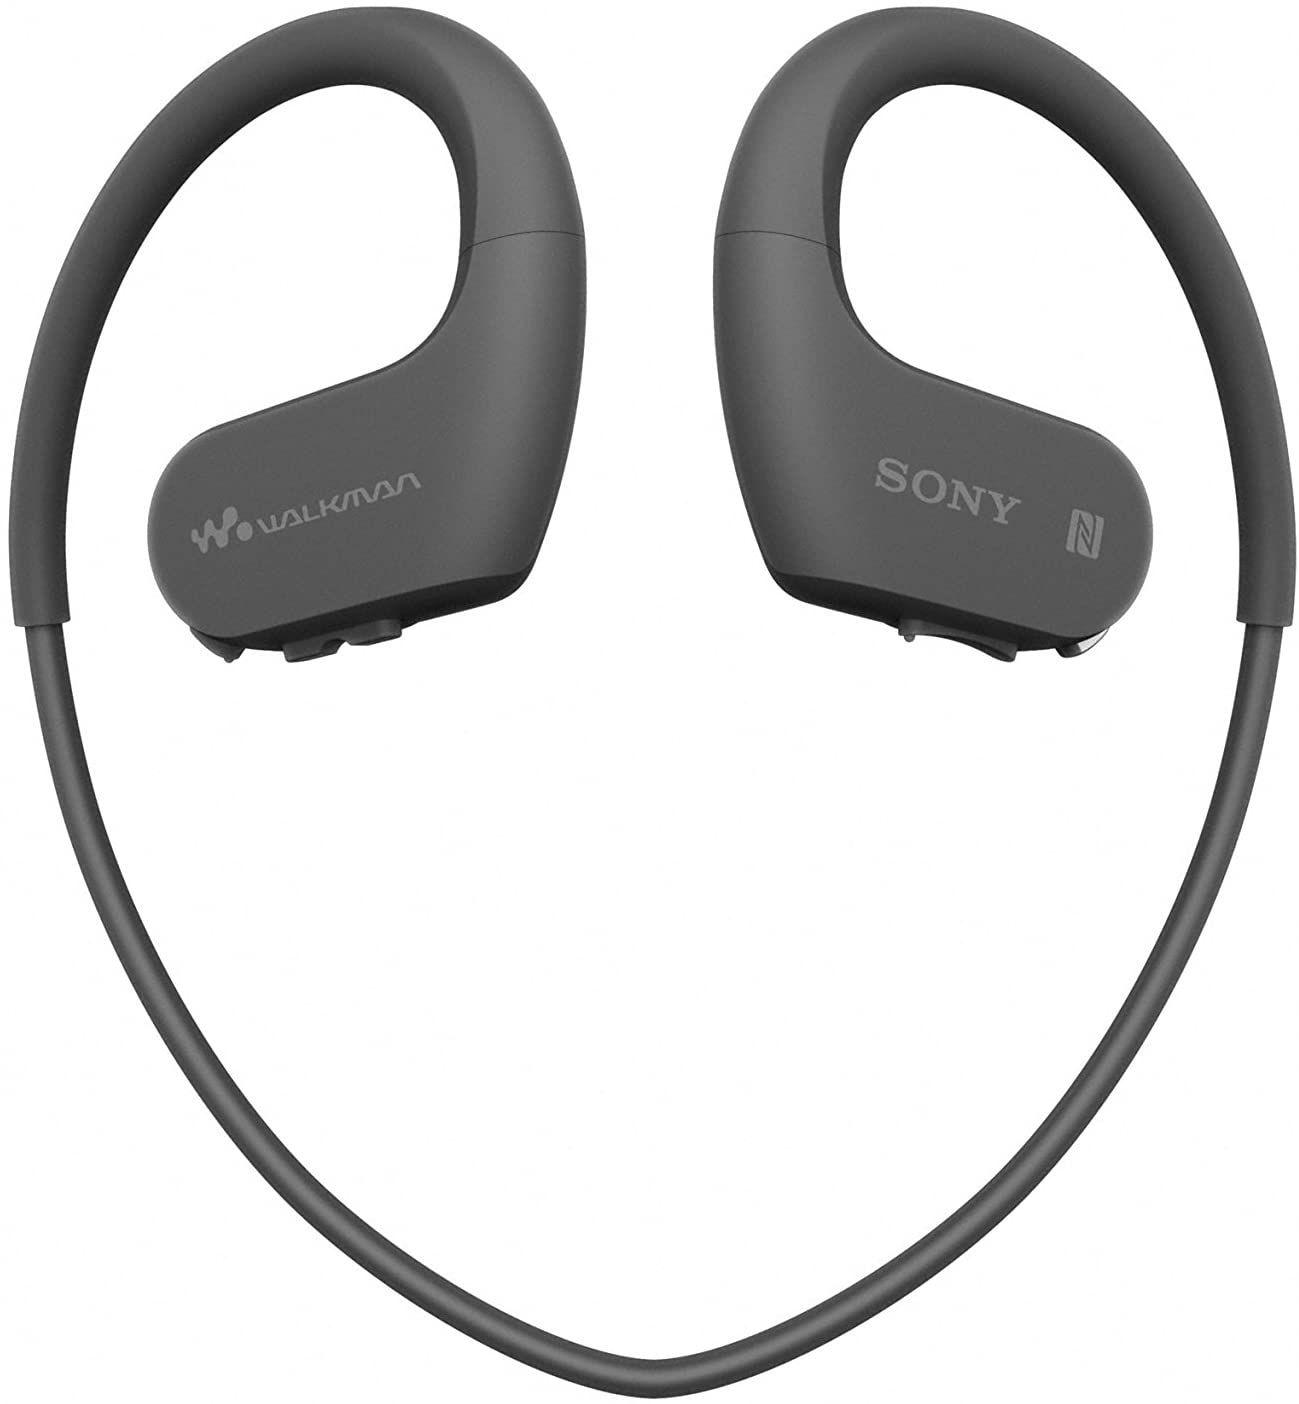 Sony NWWS623/B Waterproof and Dustproof Walkman with Bluetooth